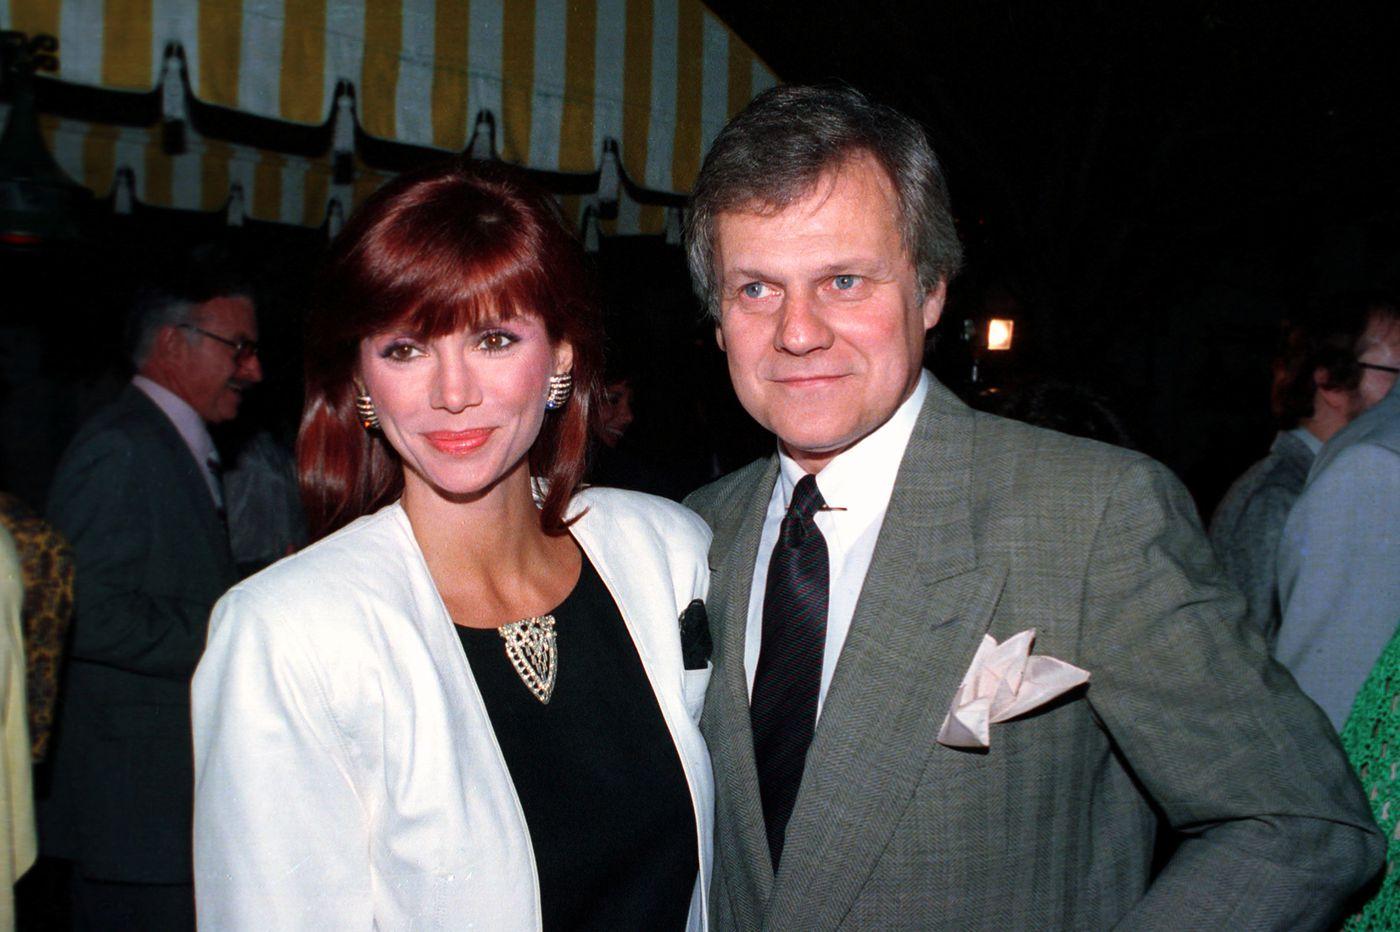 Ken Kercheval, beleaguered Cliff Barnes on 'Dallas,' dies at 83